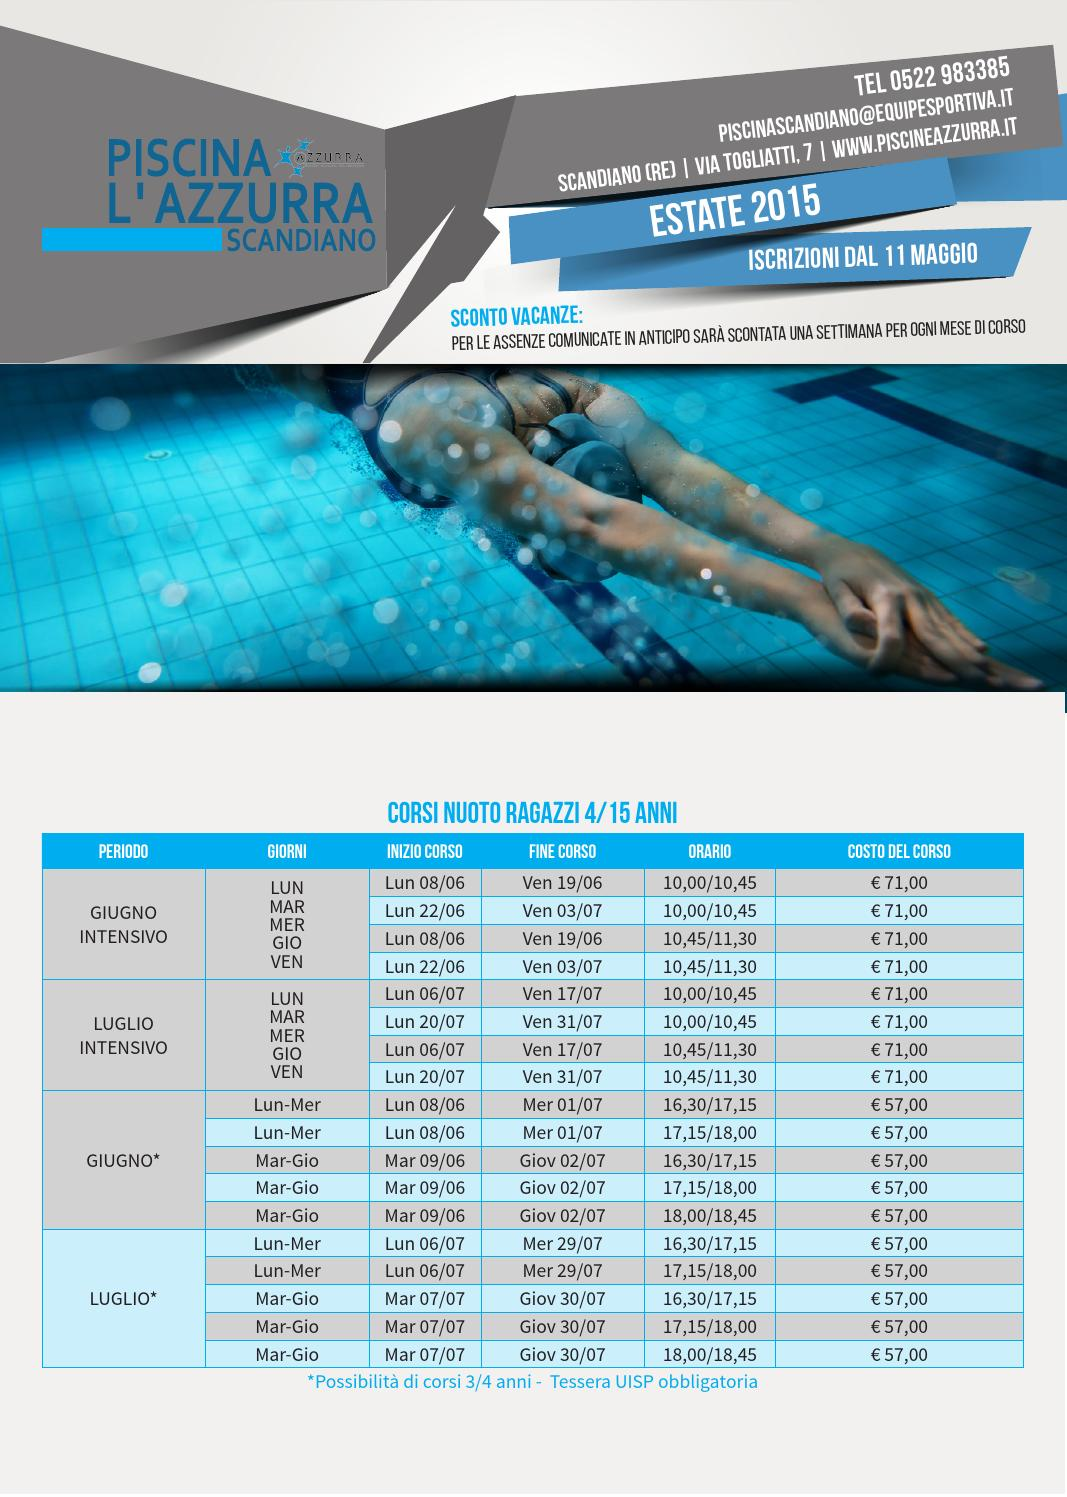 Corsi piscina estate 2015 azzurra scandiano by equipe sportiva srl ssd issuu - Piscina azzurra scandiano ...